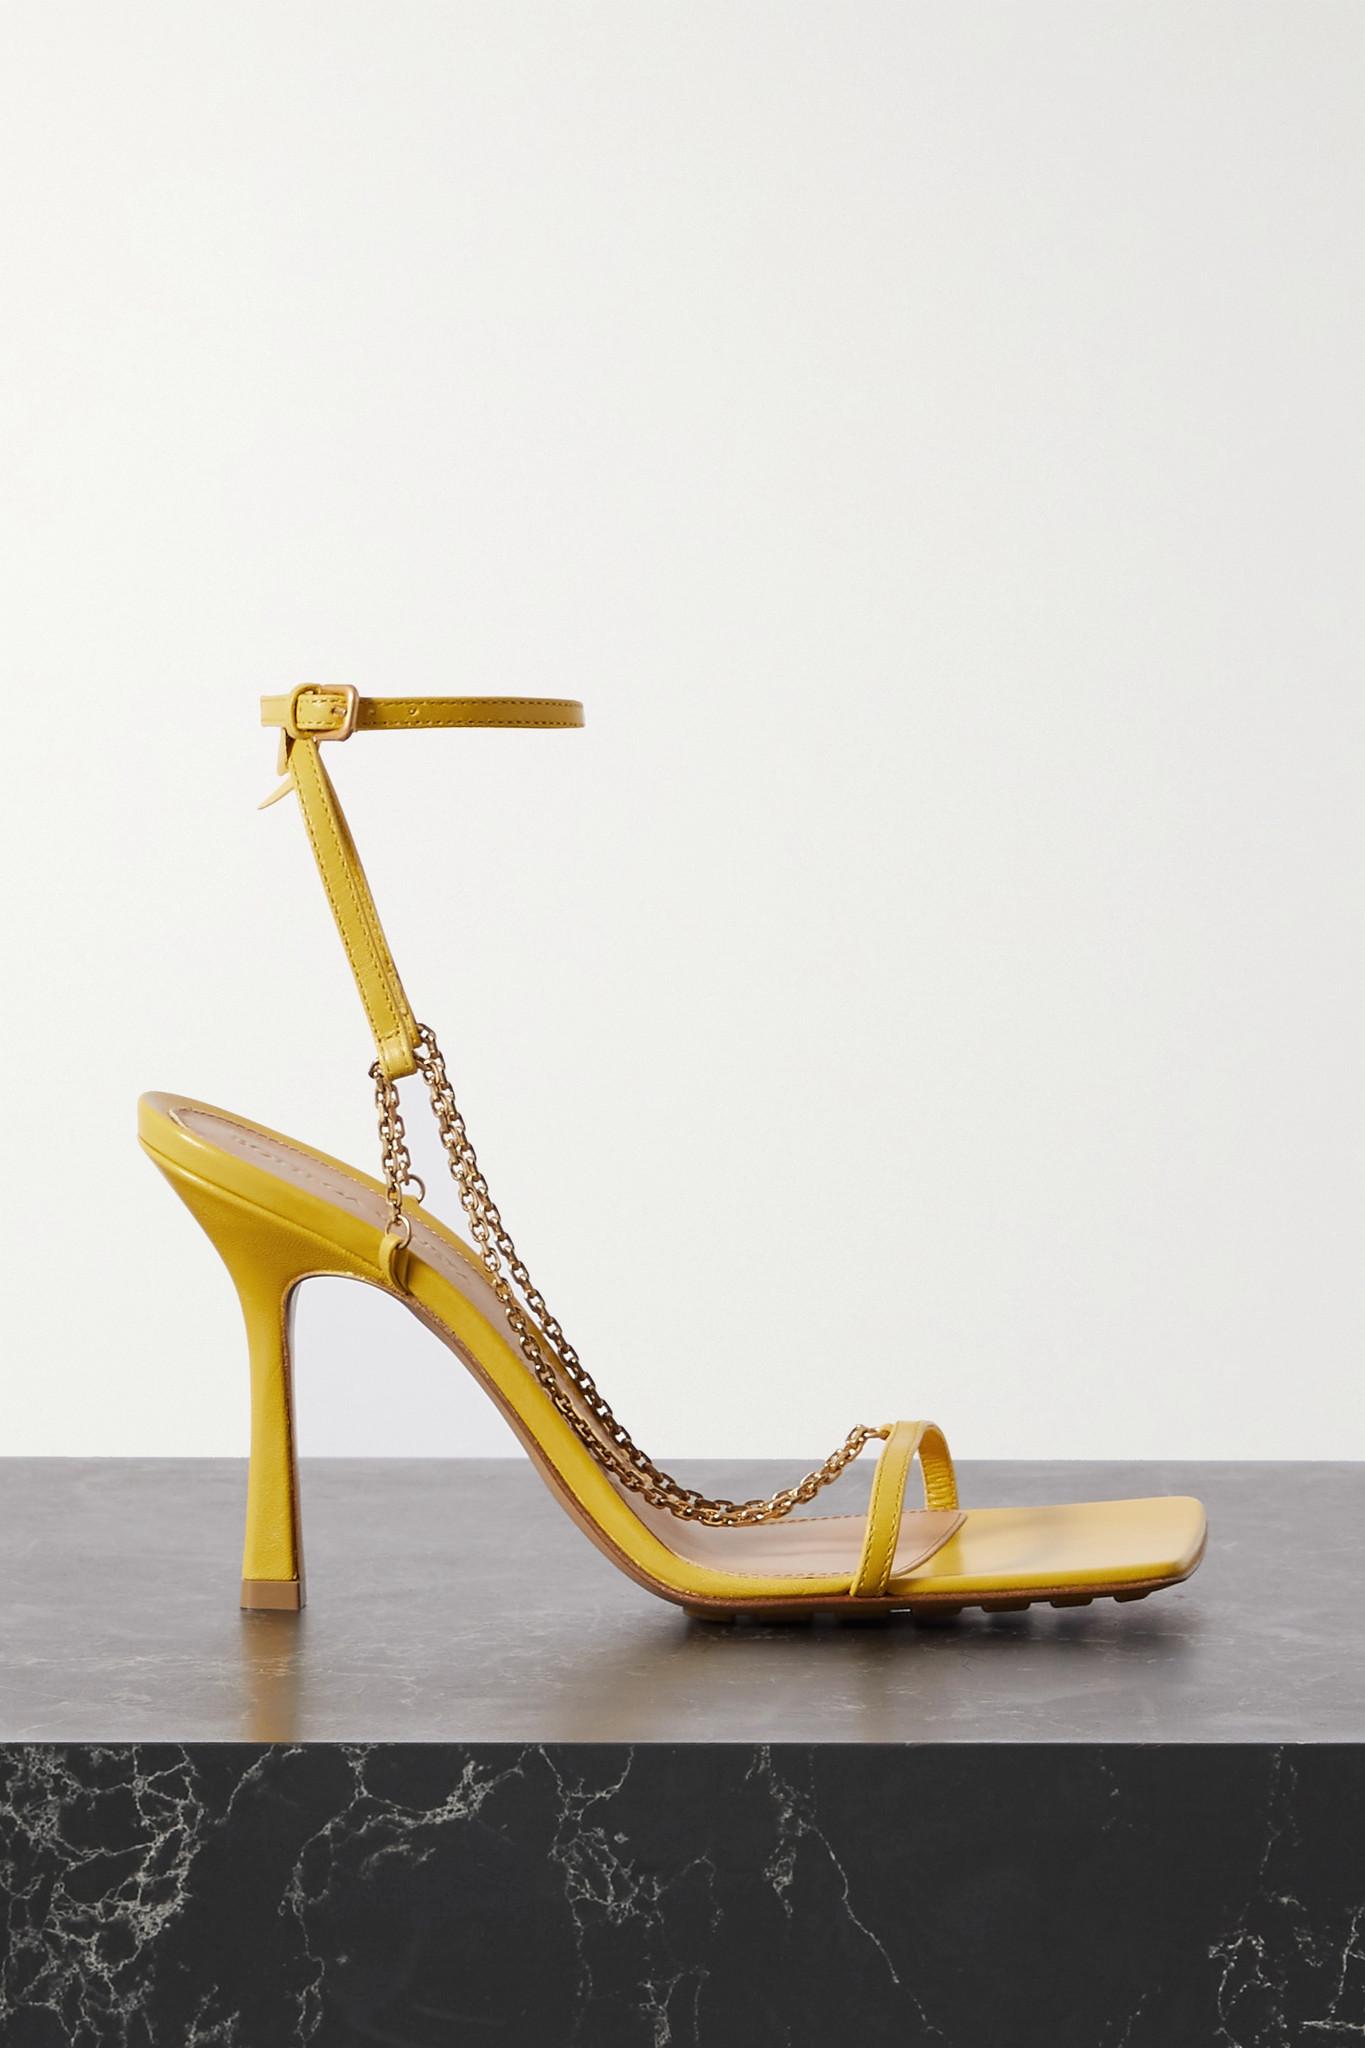 BOTTEGA VENETA - 链条缀饰皮革凉鞋 - 黄色 - IT40.5